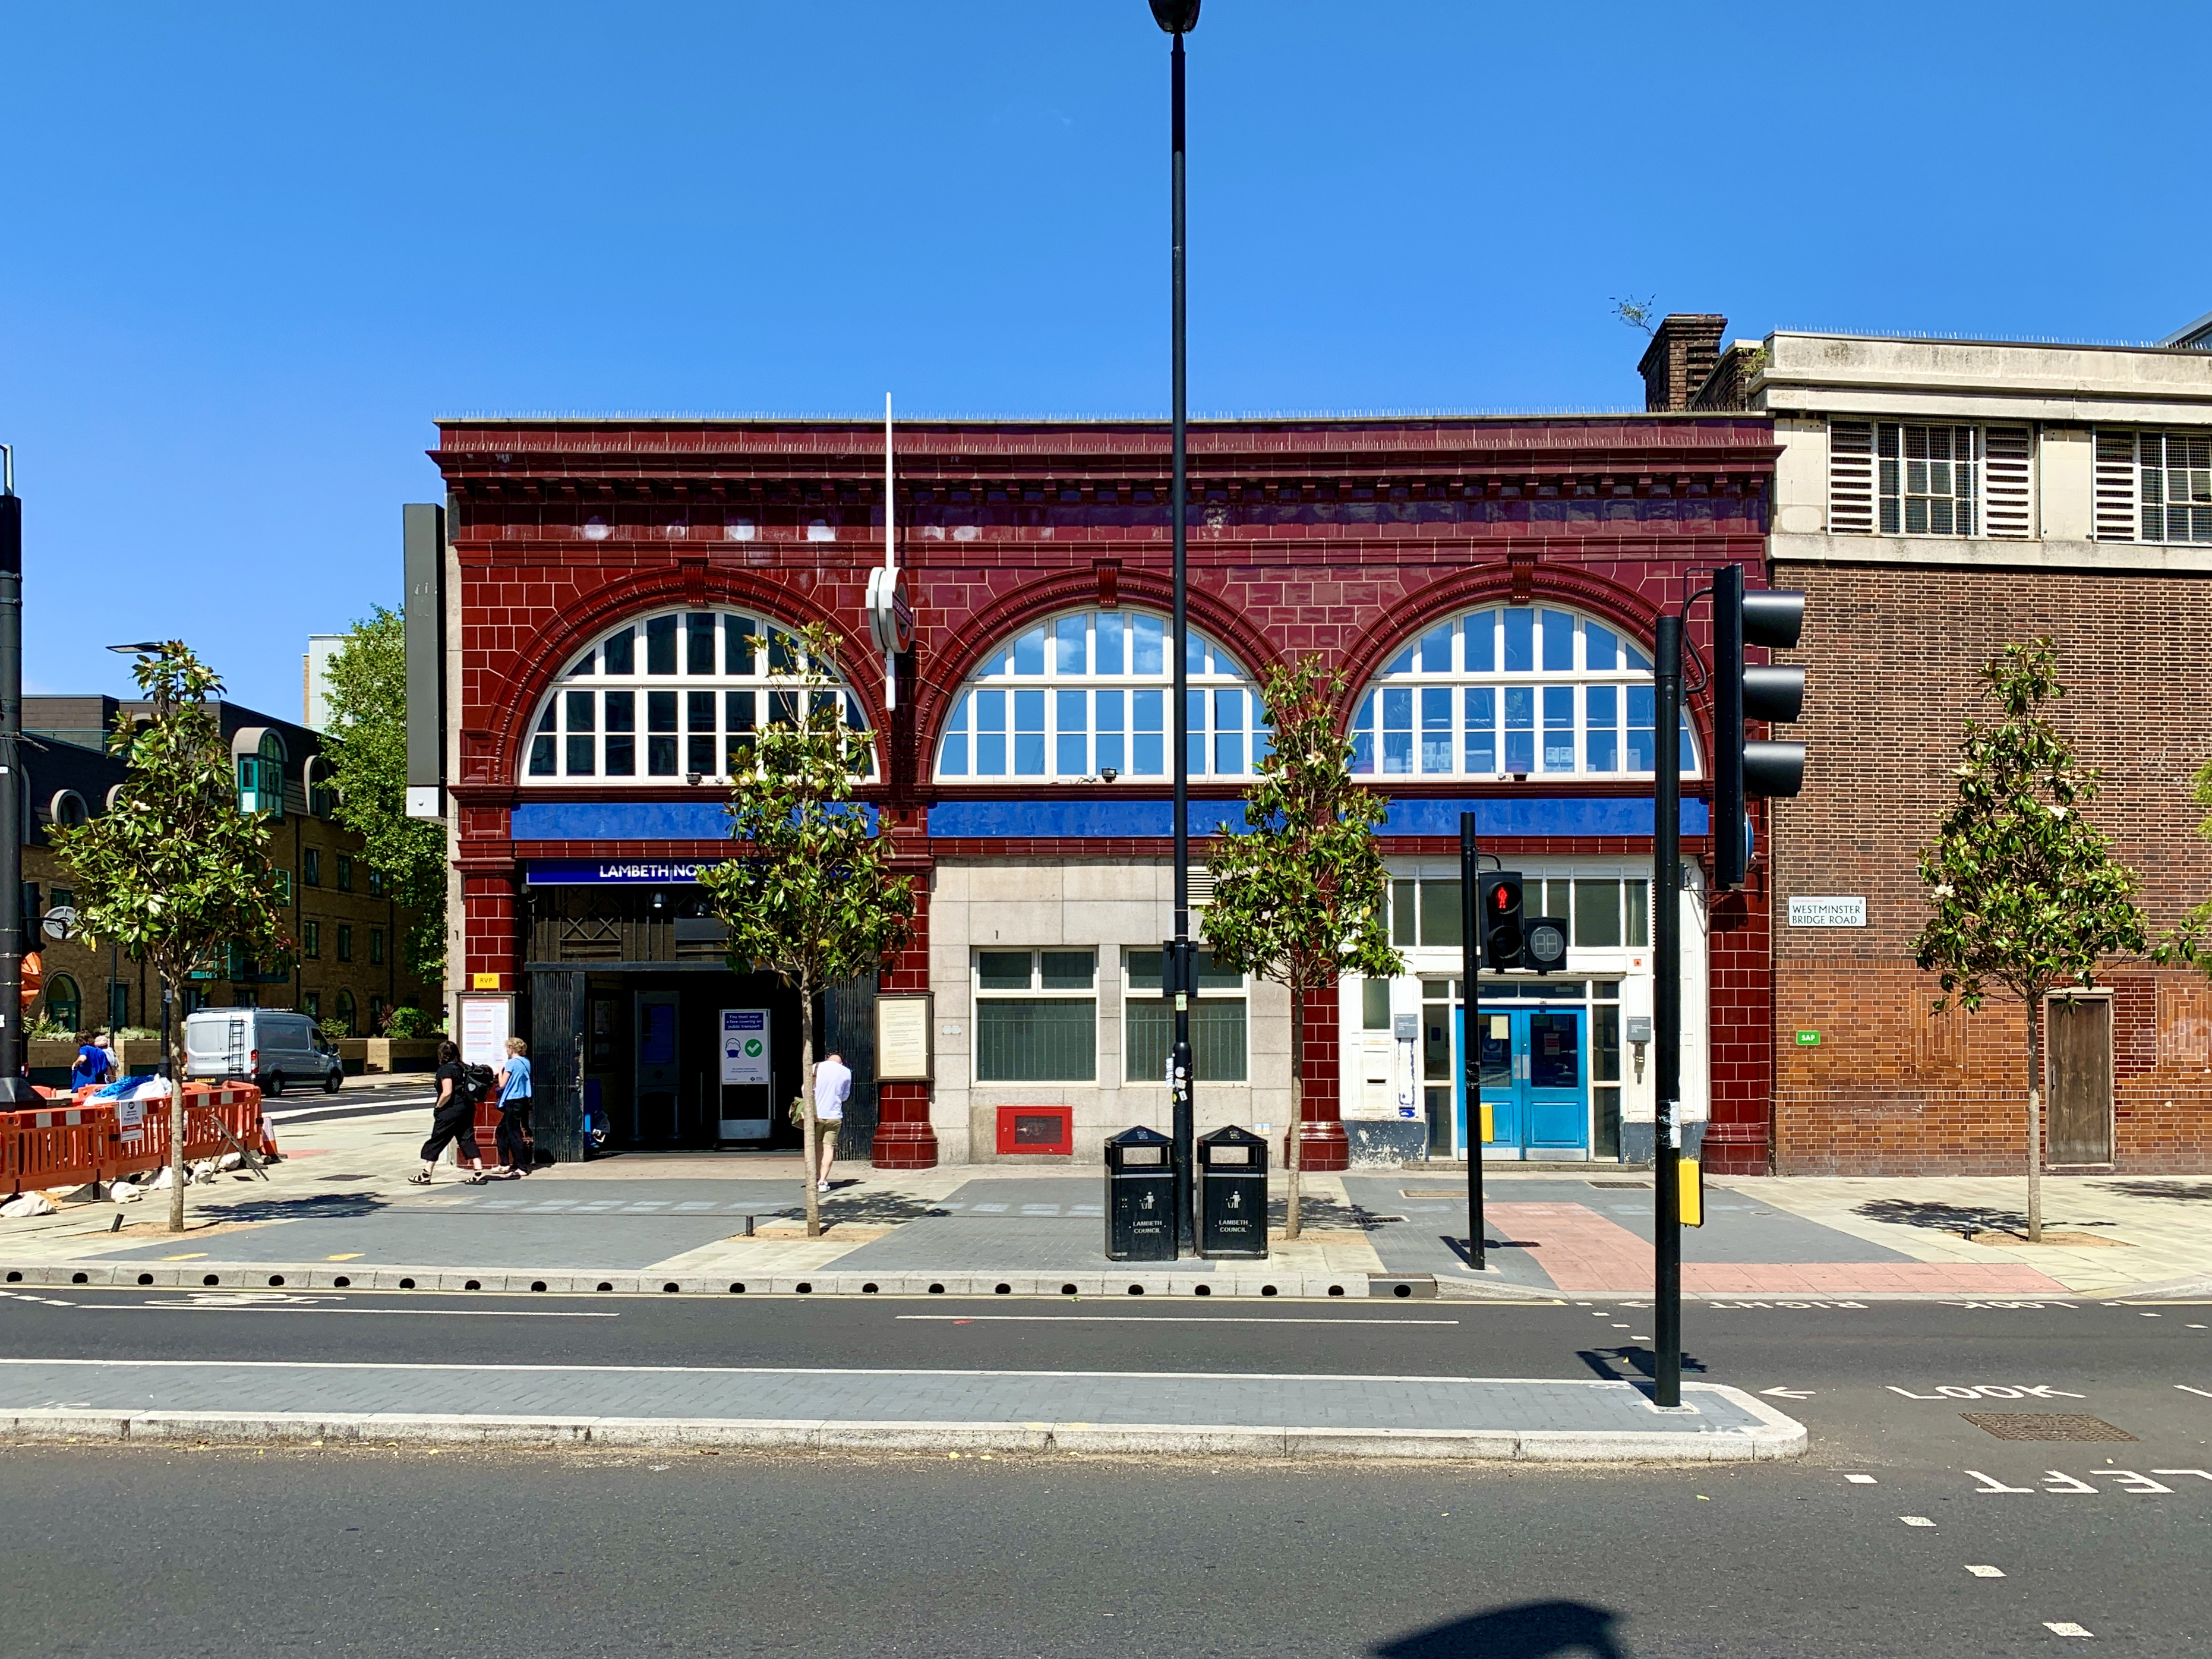 Lambeth North tube station - Wikipedia